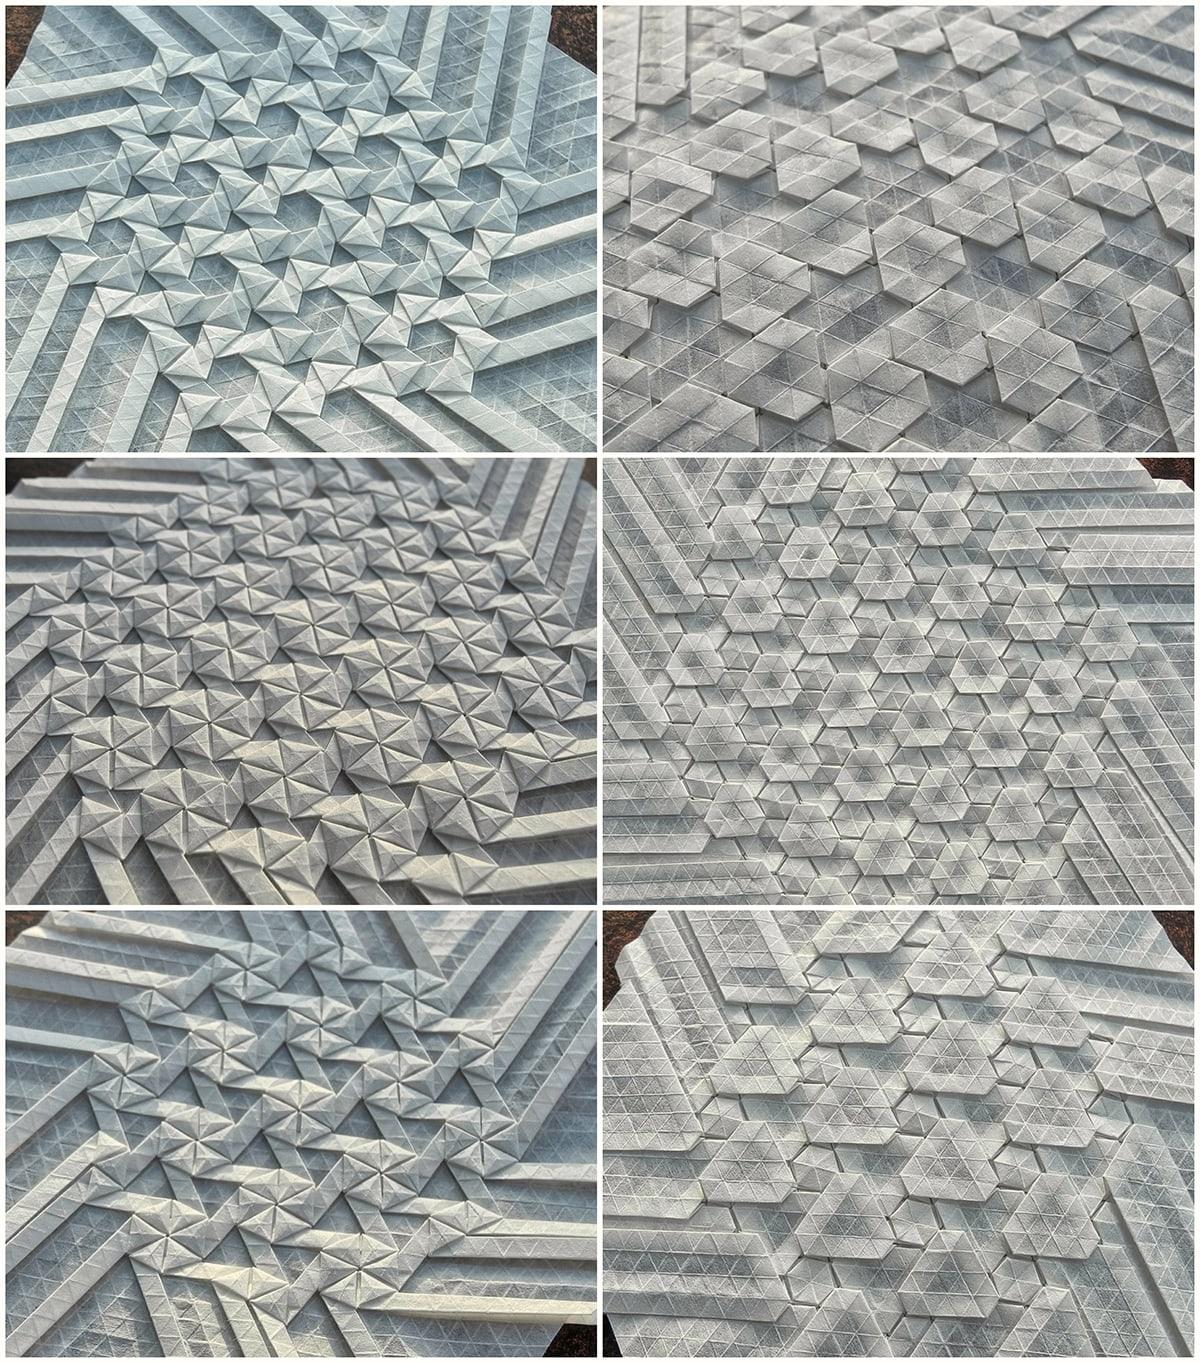 Friendship Tessellations